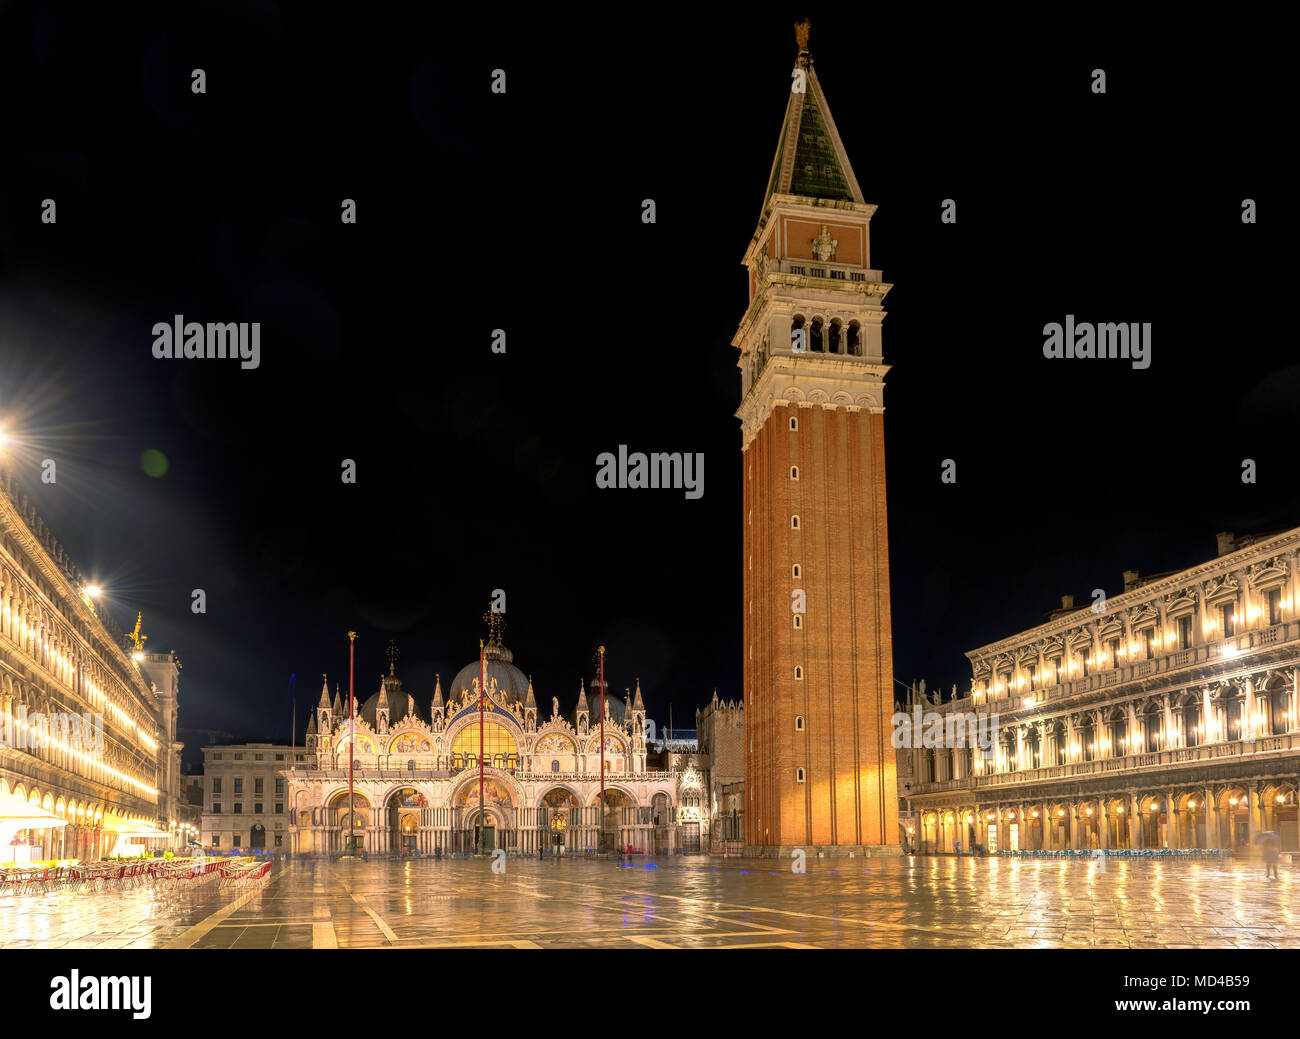 Schönen San Marco Square bei Nacht, Venedig Italien. Stockfoto